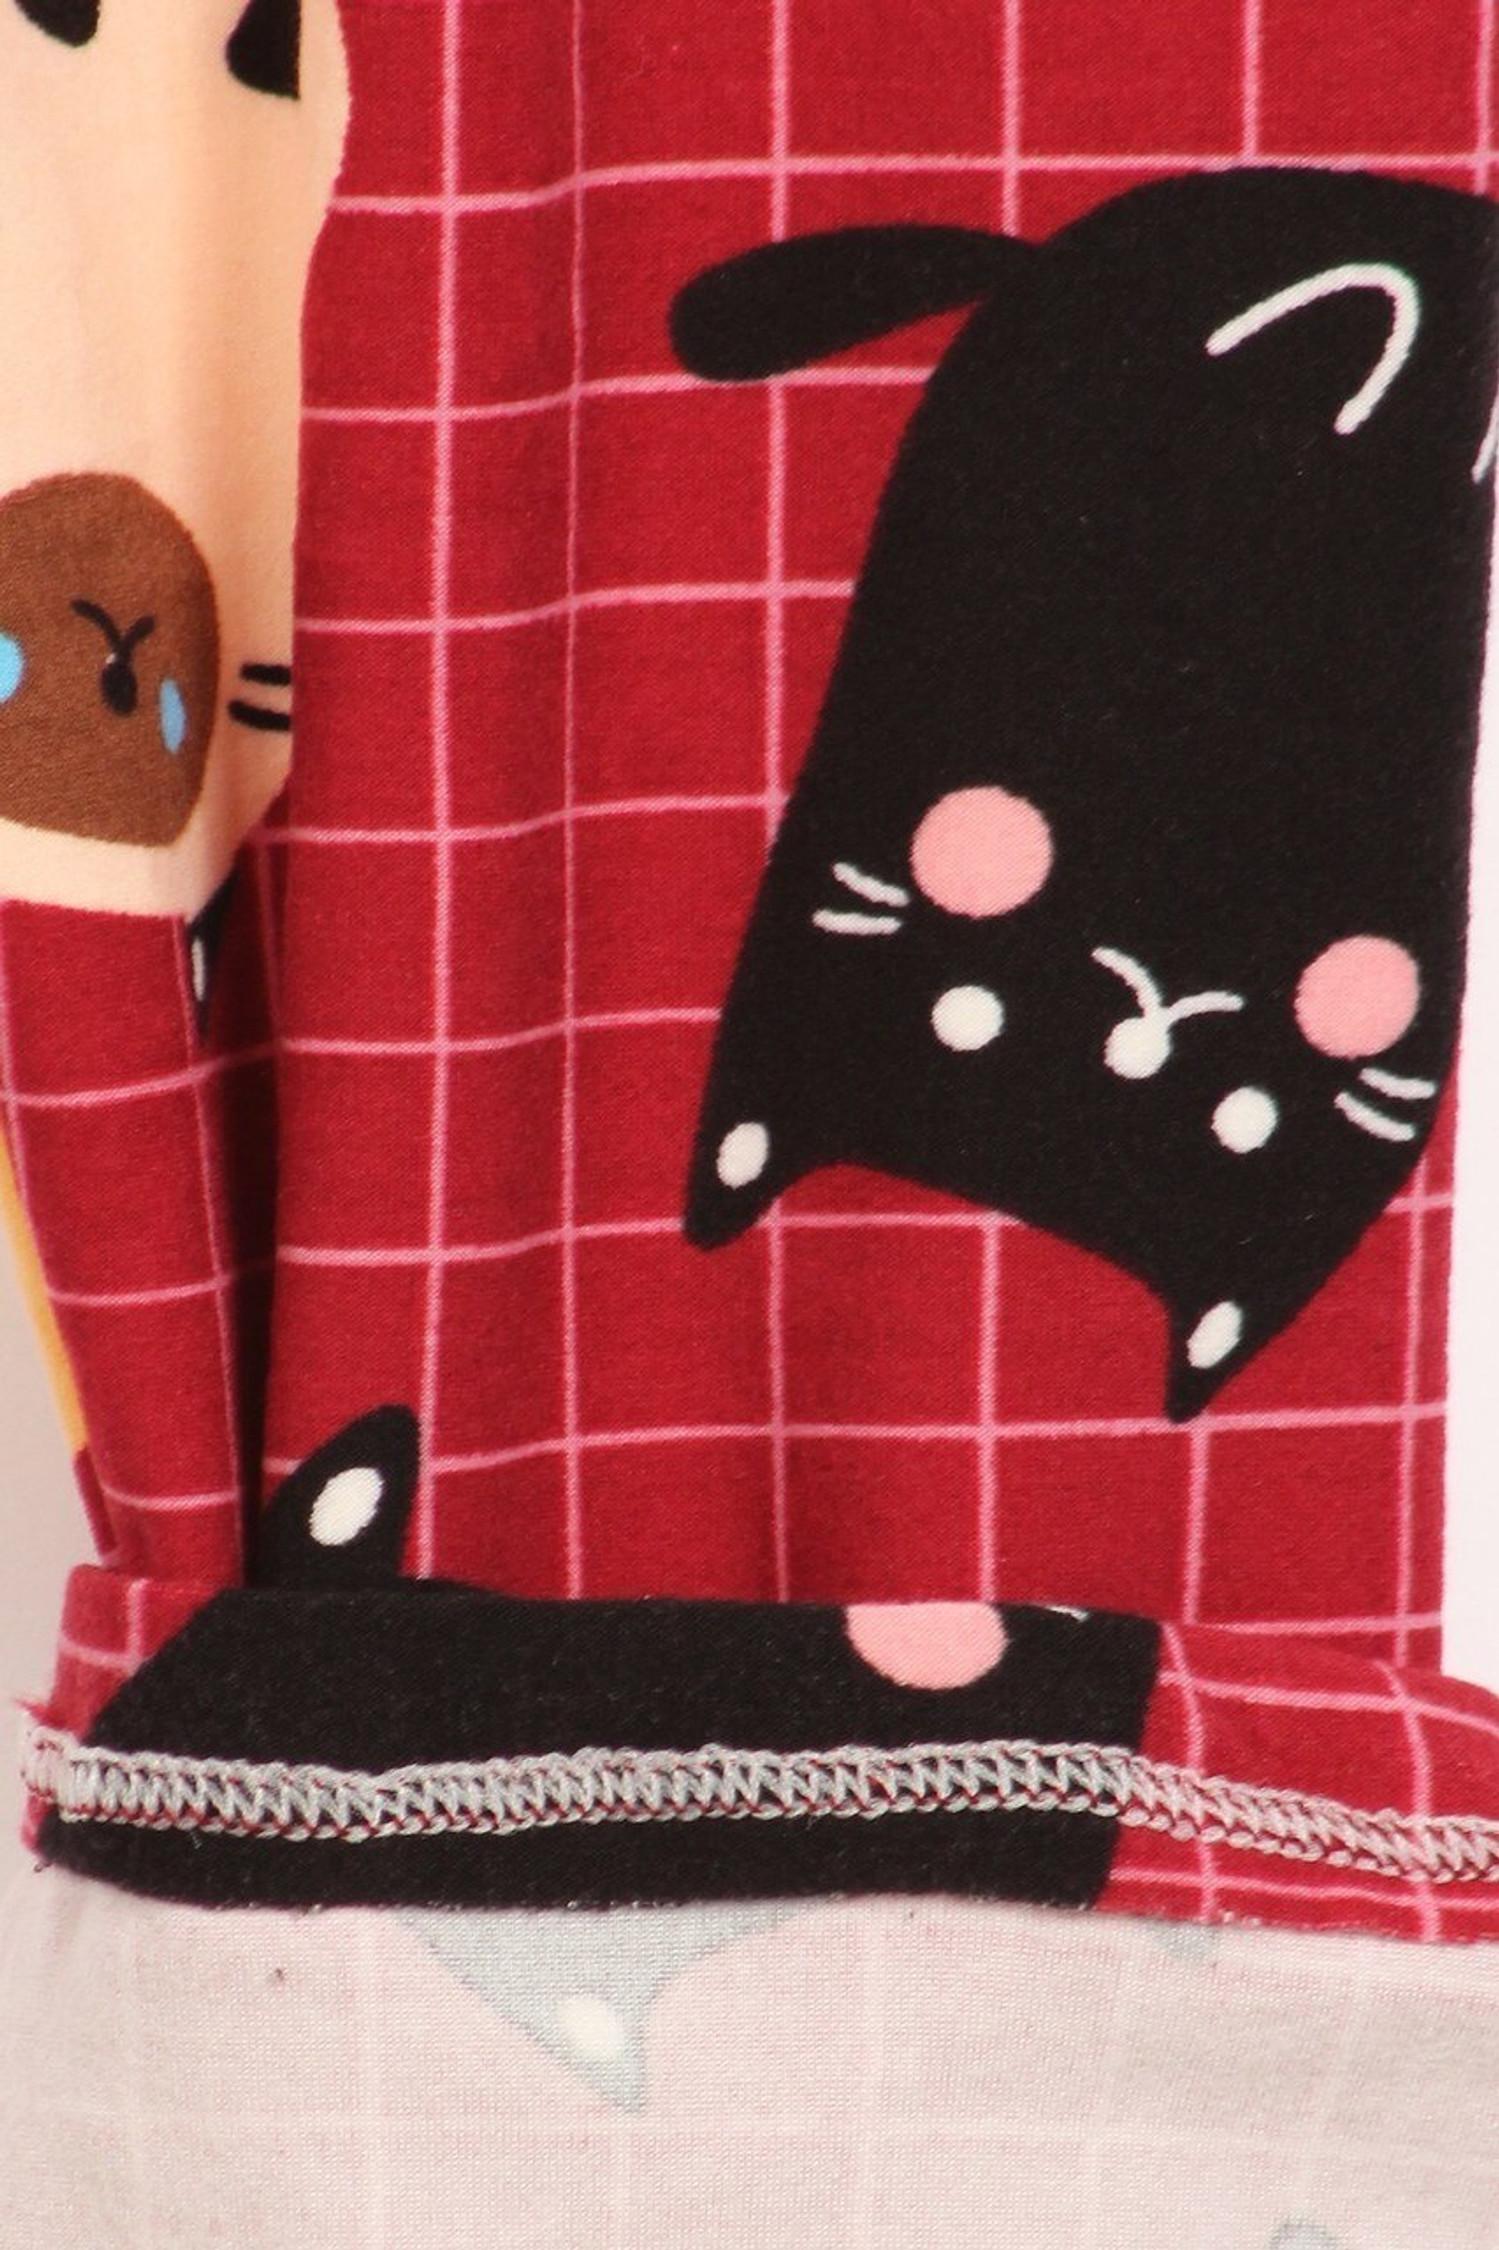 Buttery Soft Cartoon Kitty Cats Leggings